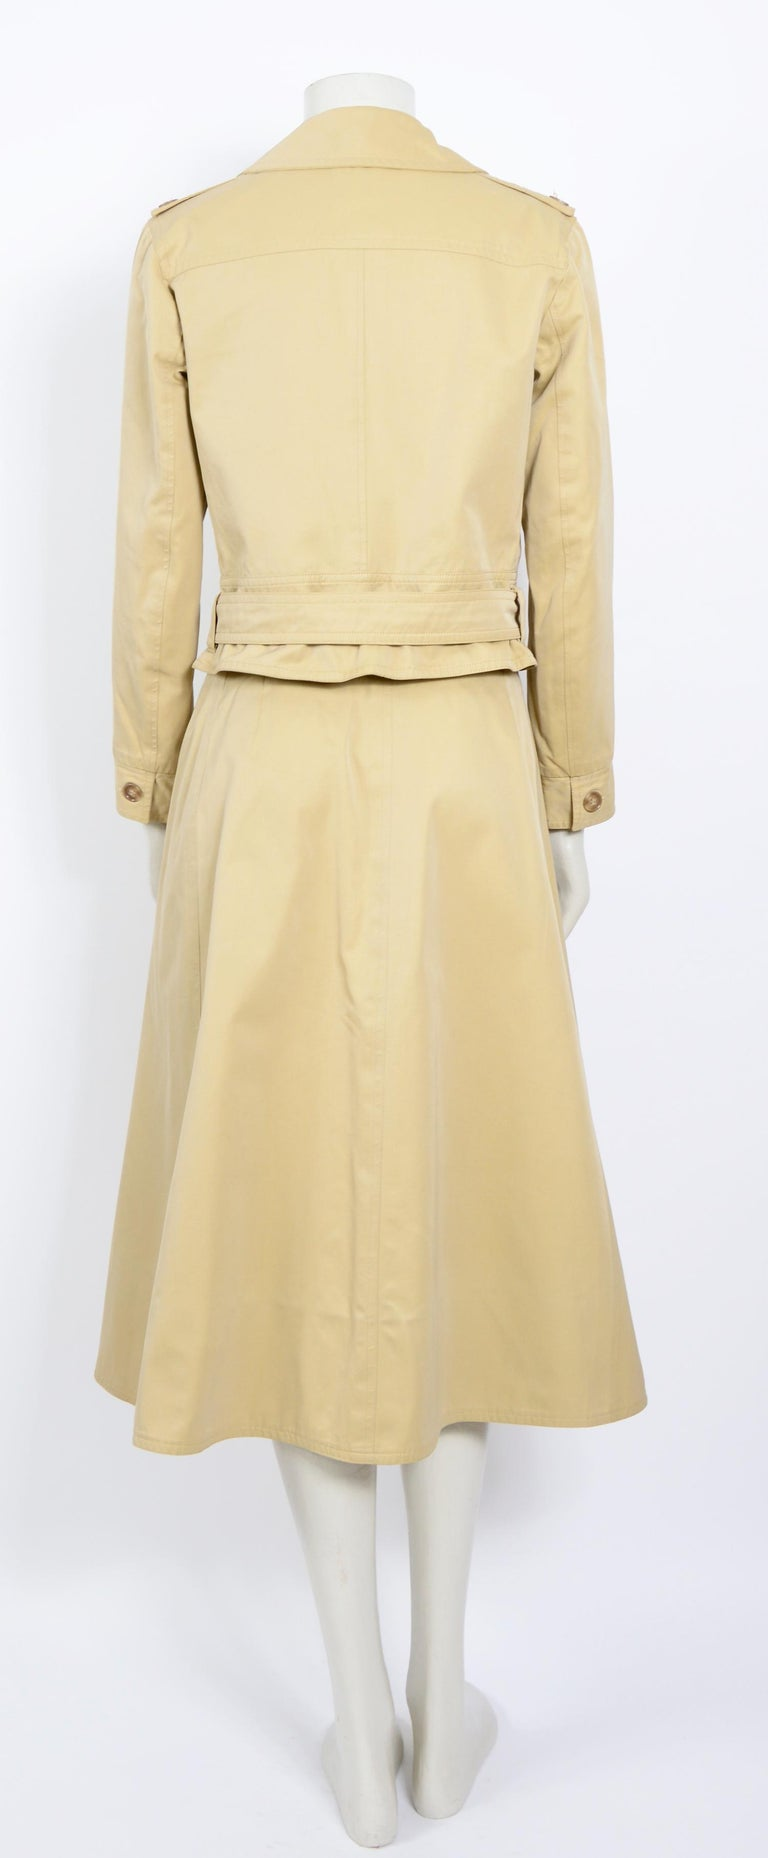 Yves Saint Laurent 1969 collection safari suit as seen on Loulou de la Falaise In Excellent Condition For Sale In Antwerp, BE